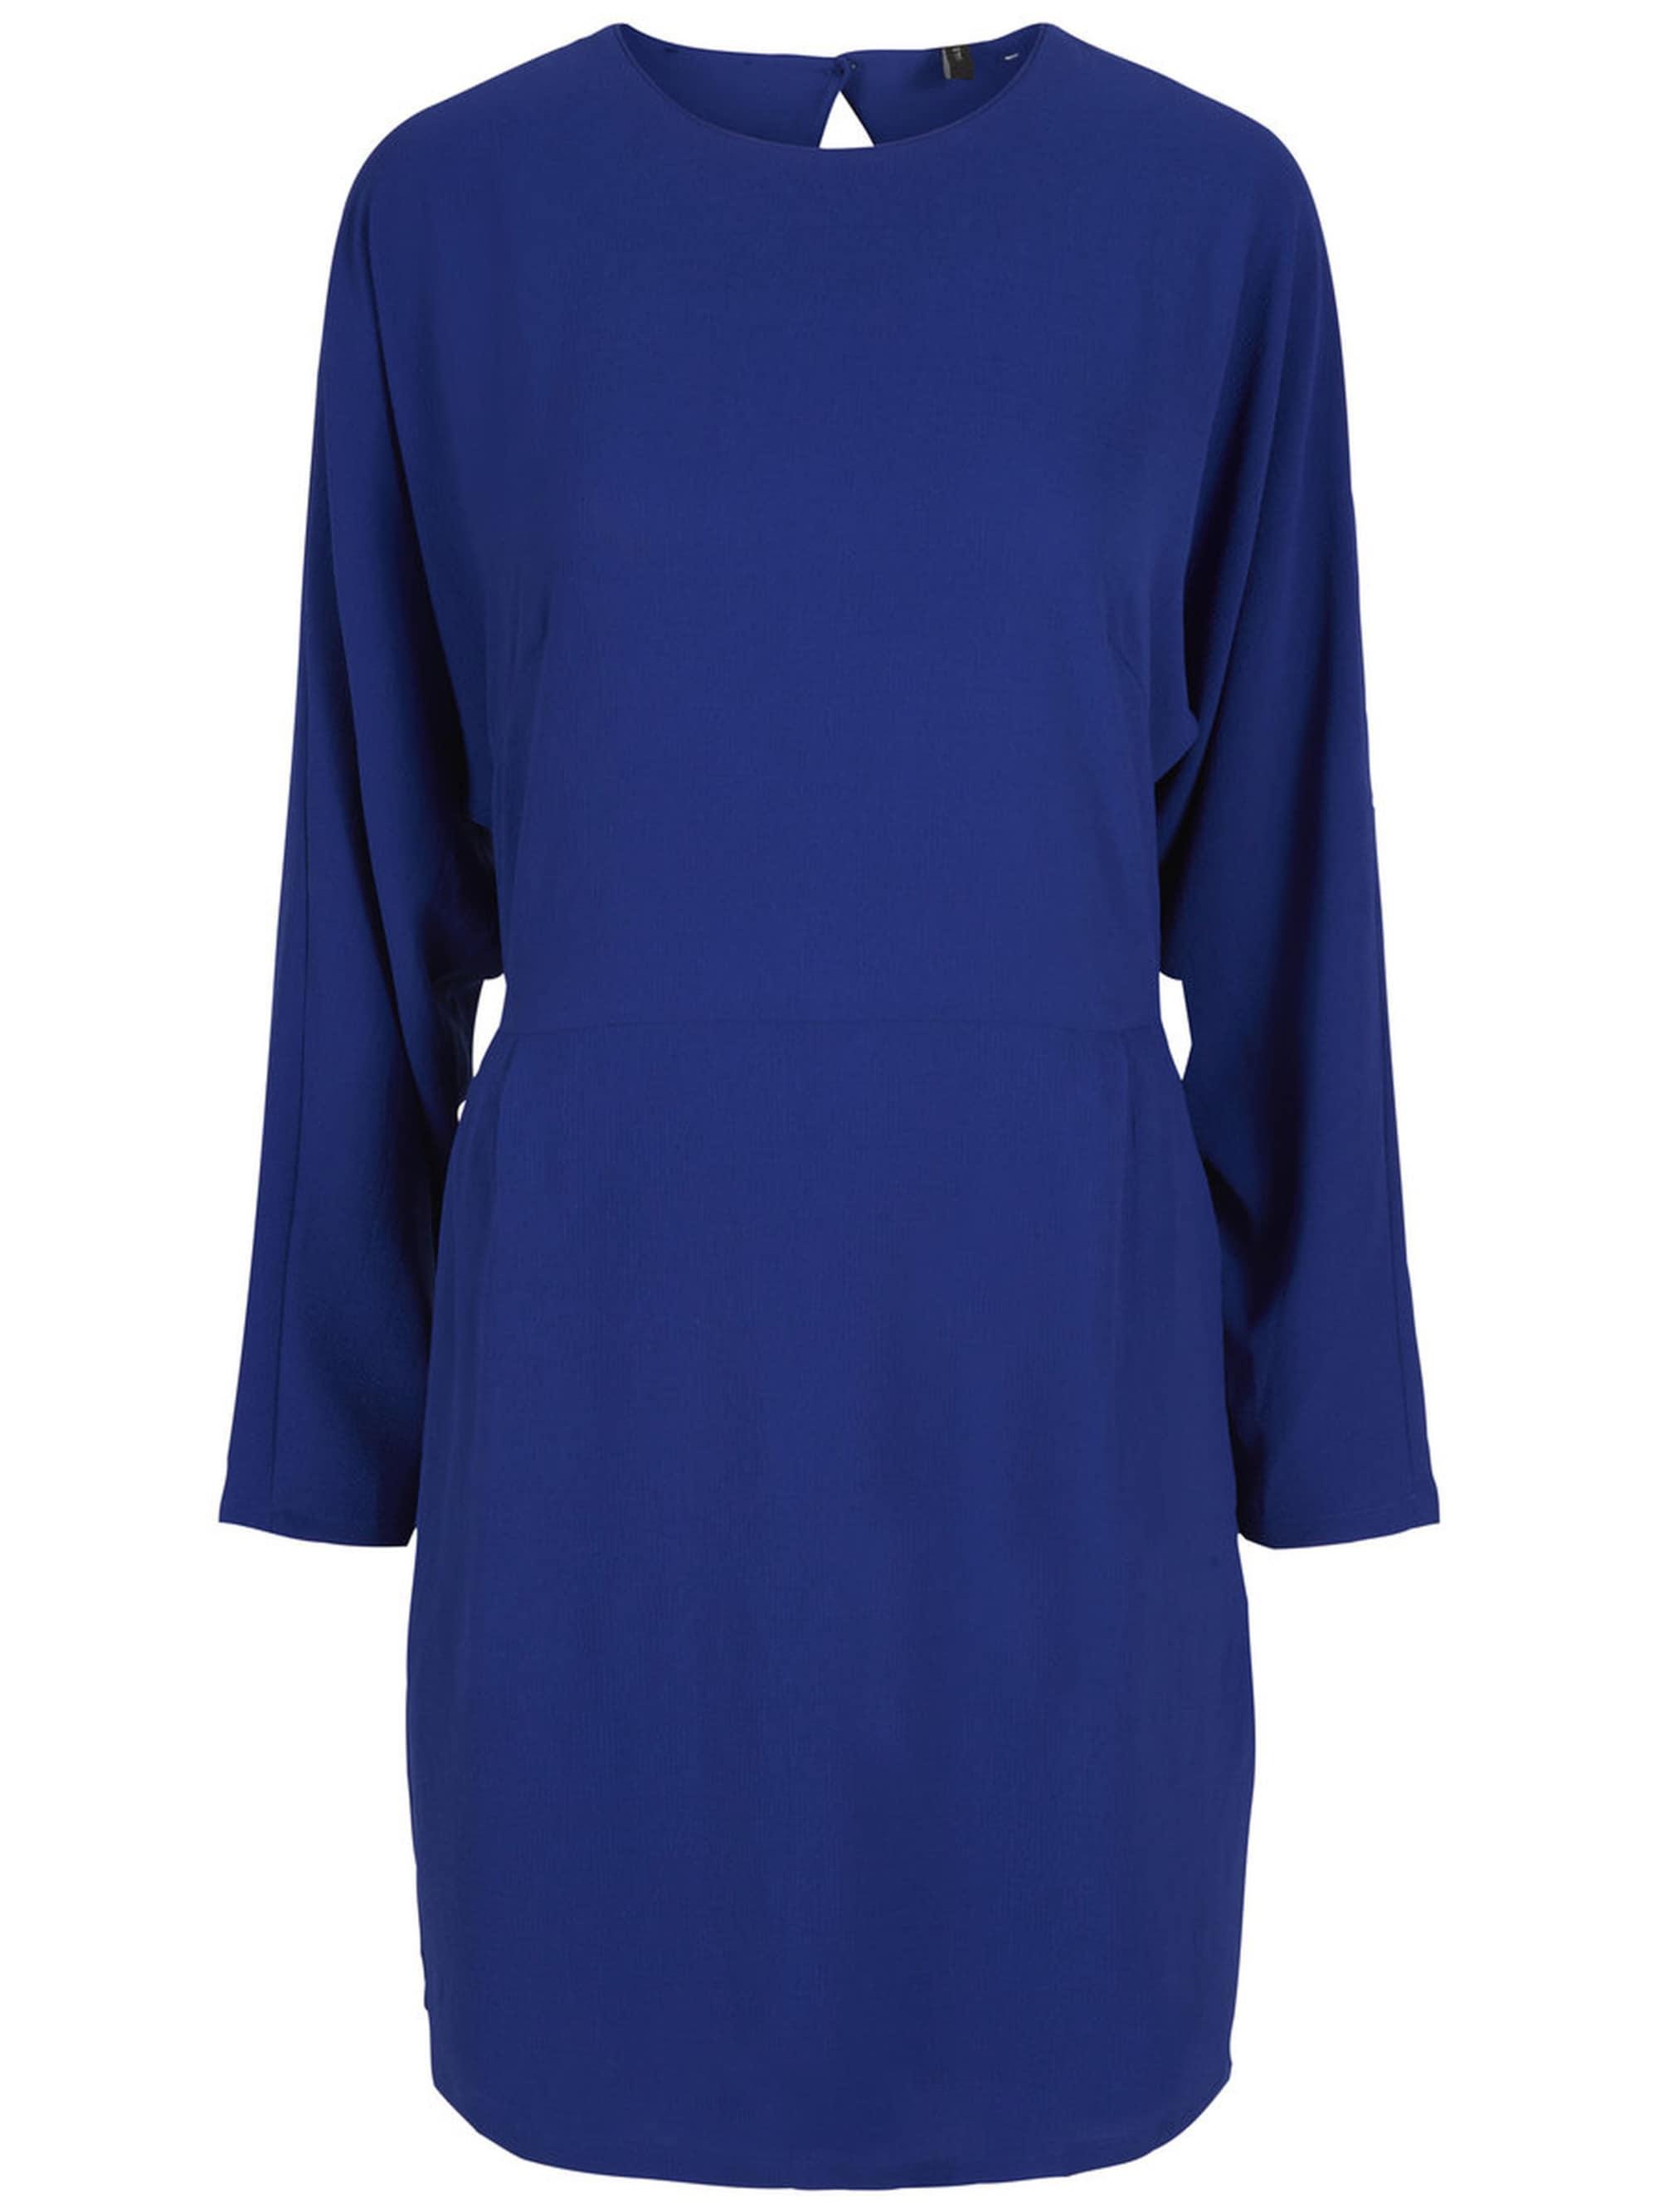 Image of Blaues Partykleid